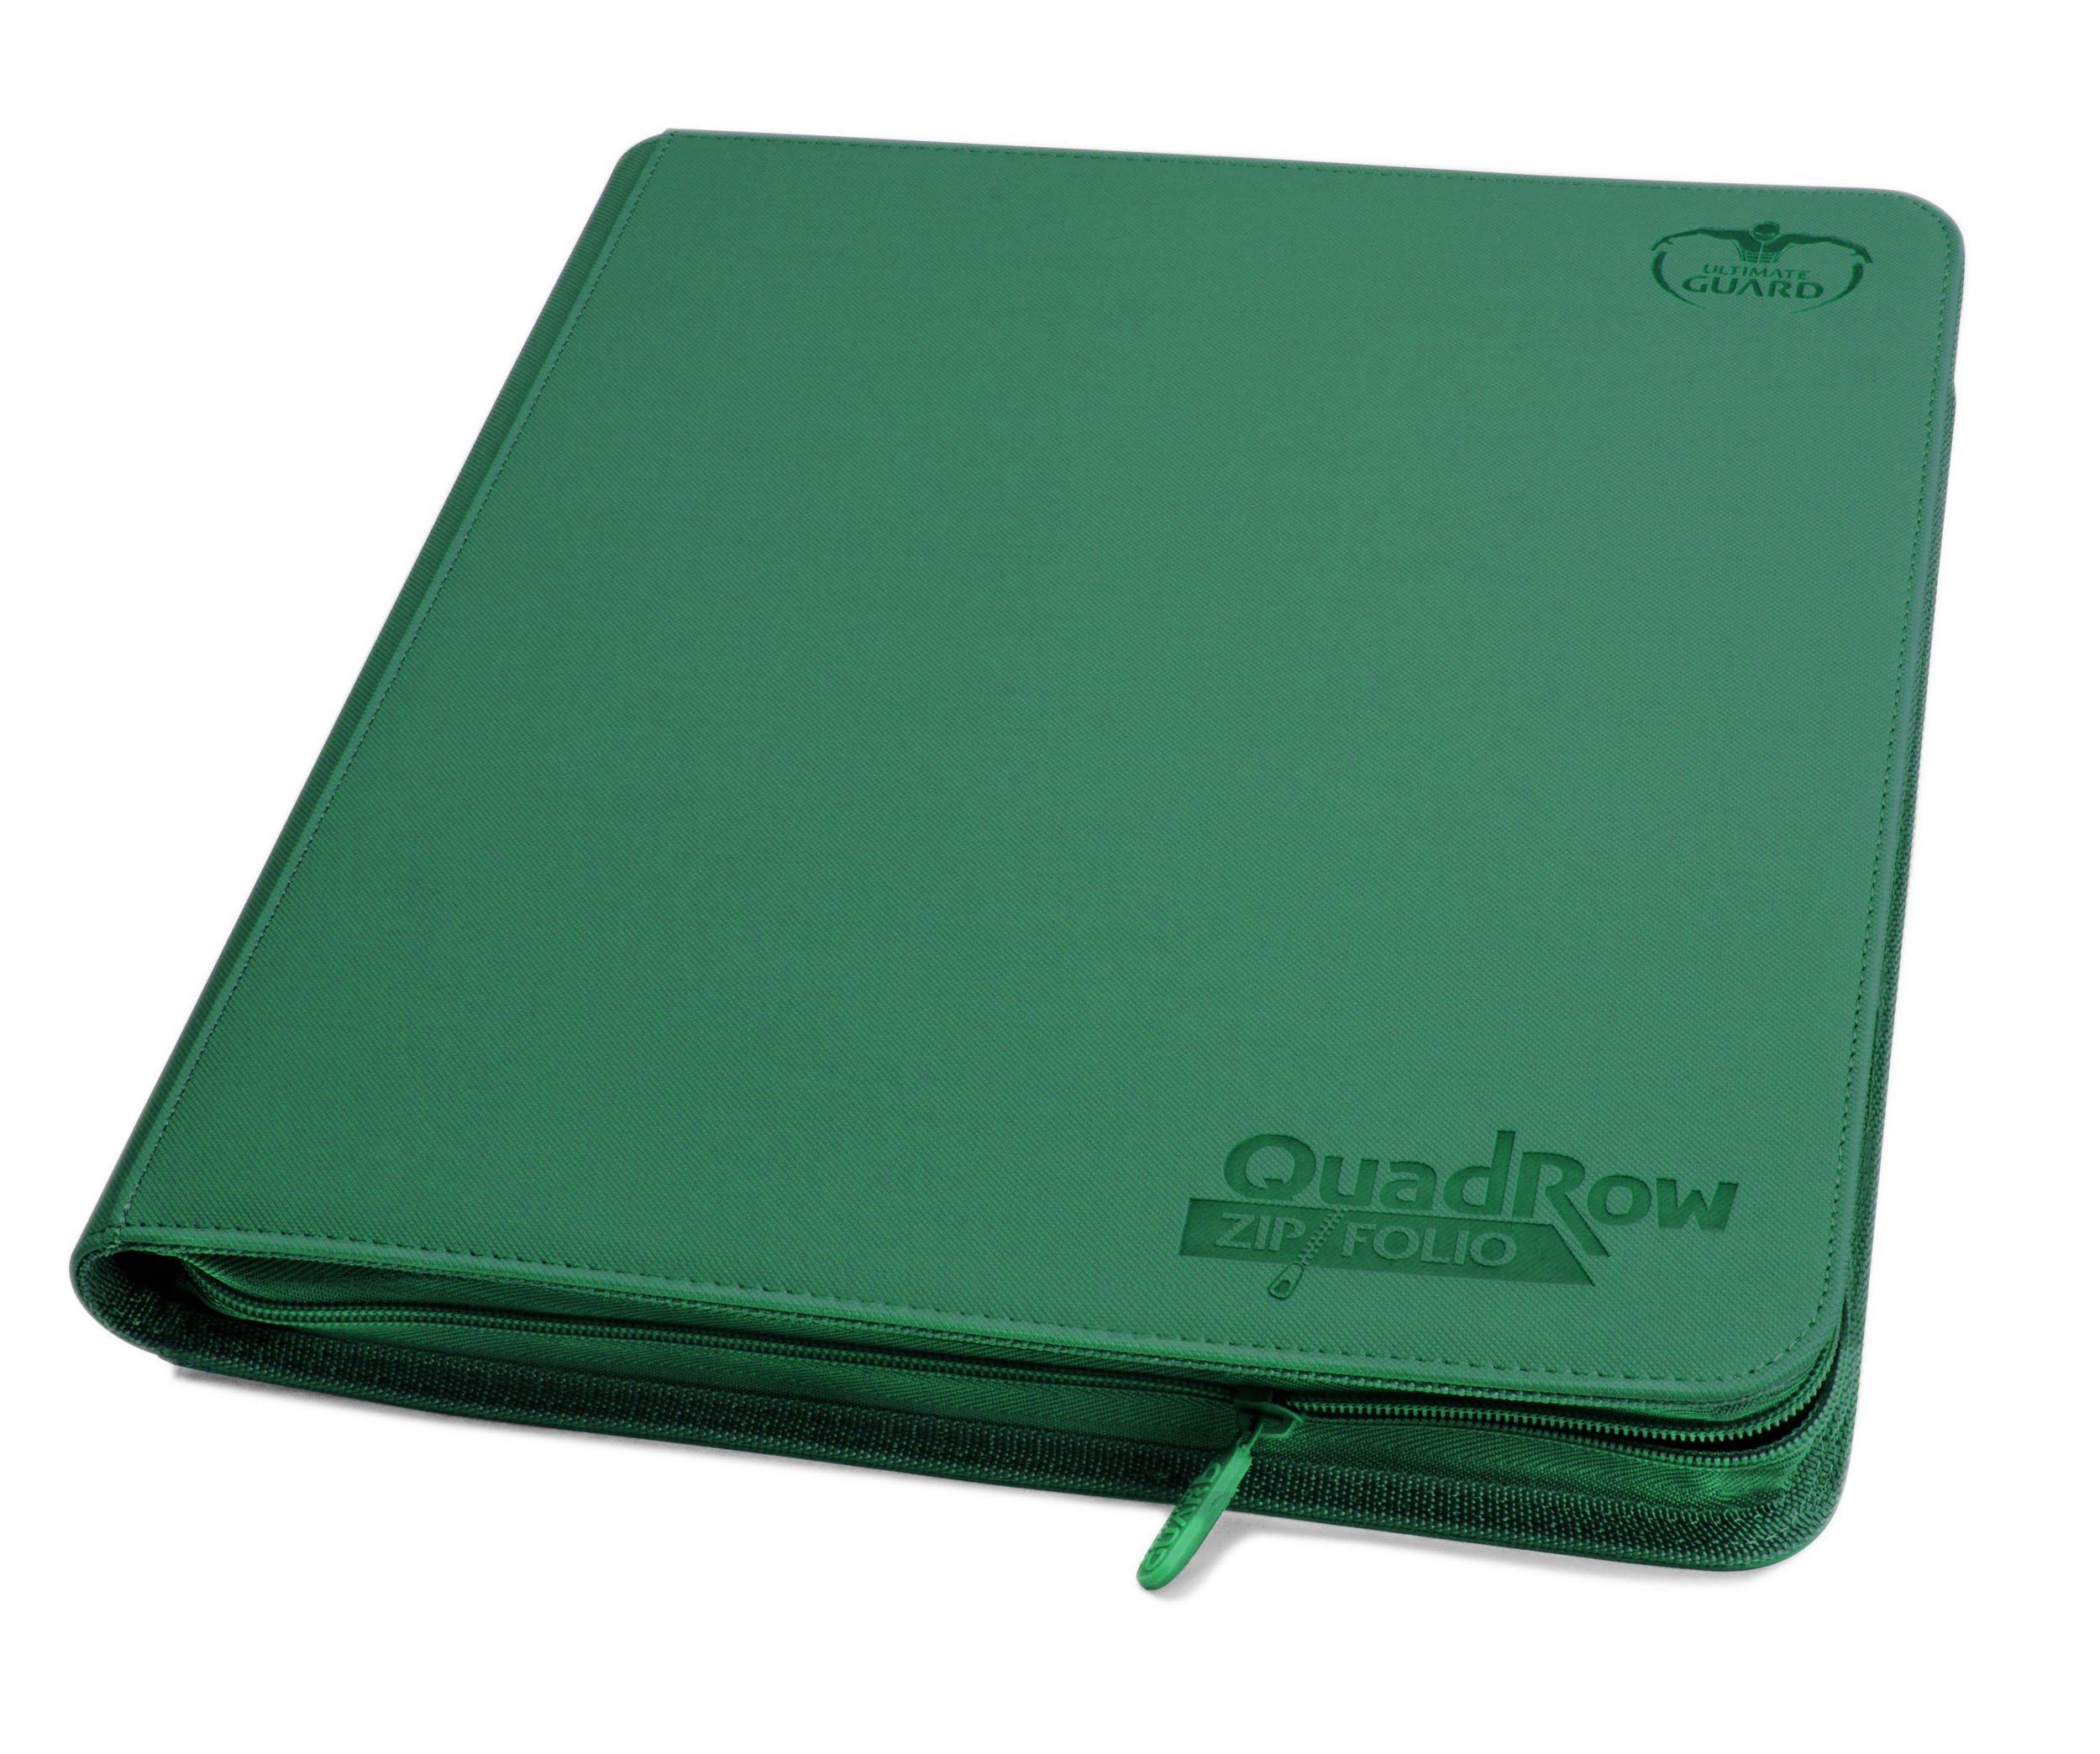 Ultimate Guard Quad Row Zipfolio Xenoskin Card Sleeves, Green